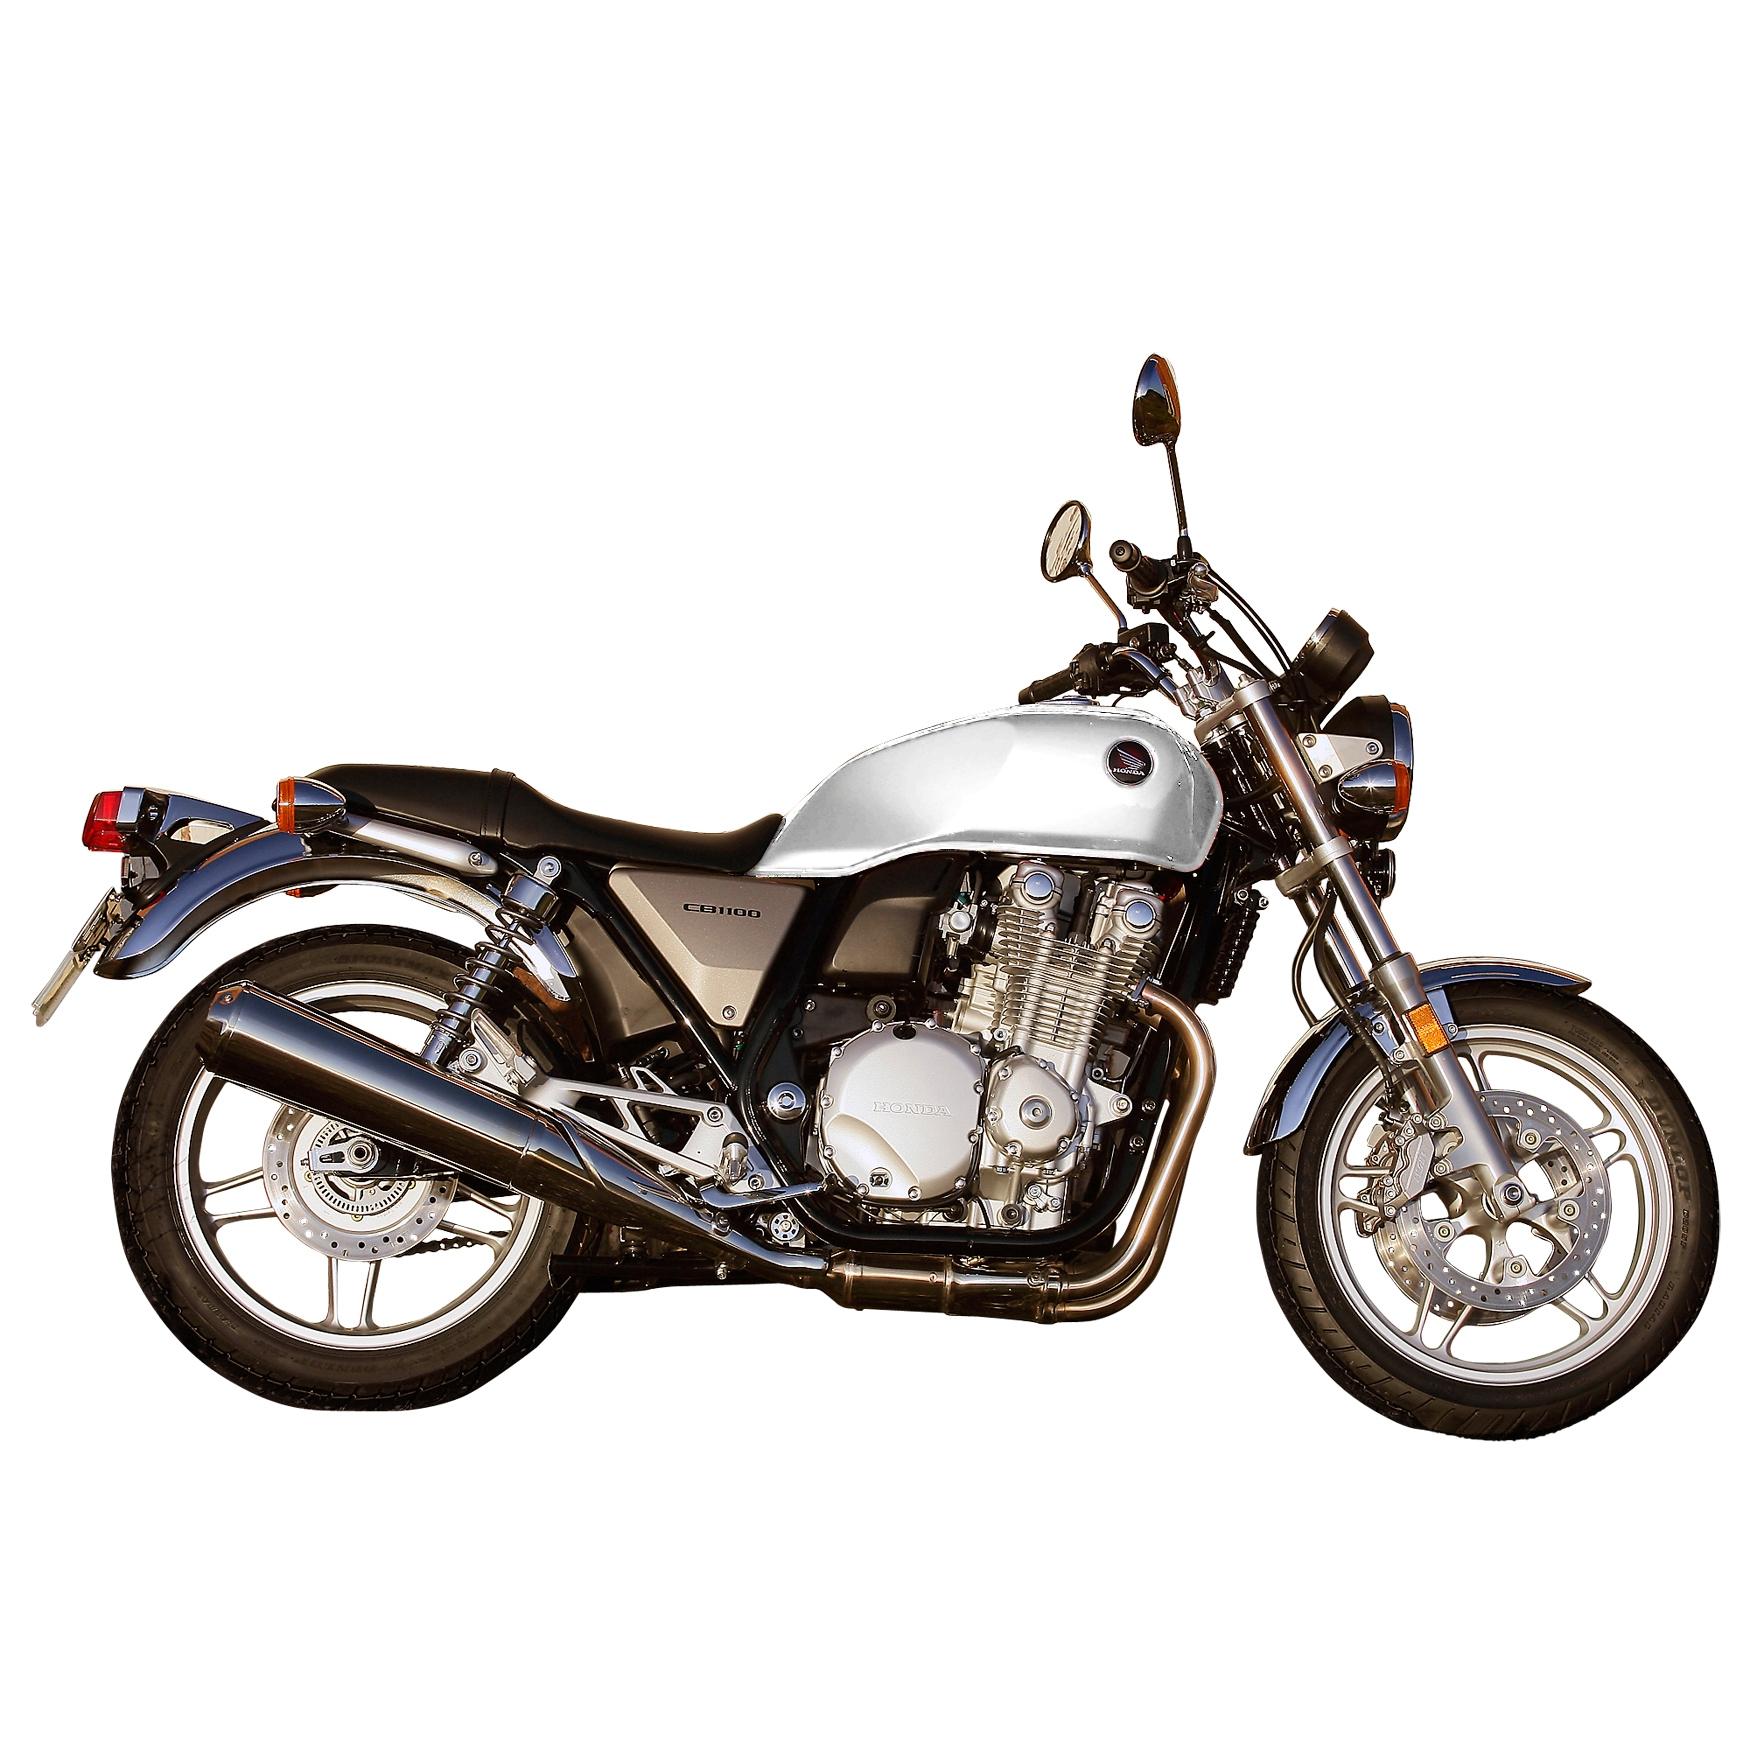 CB1100 blanche